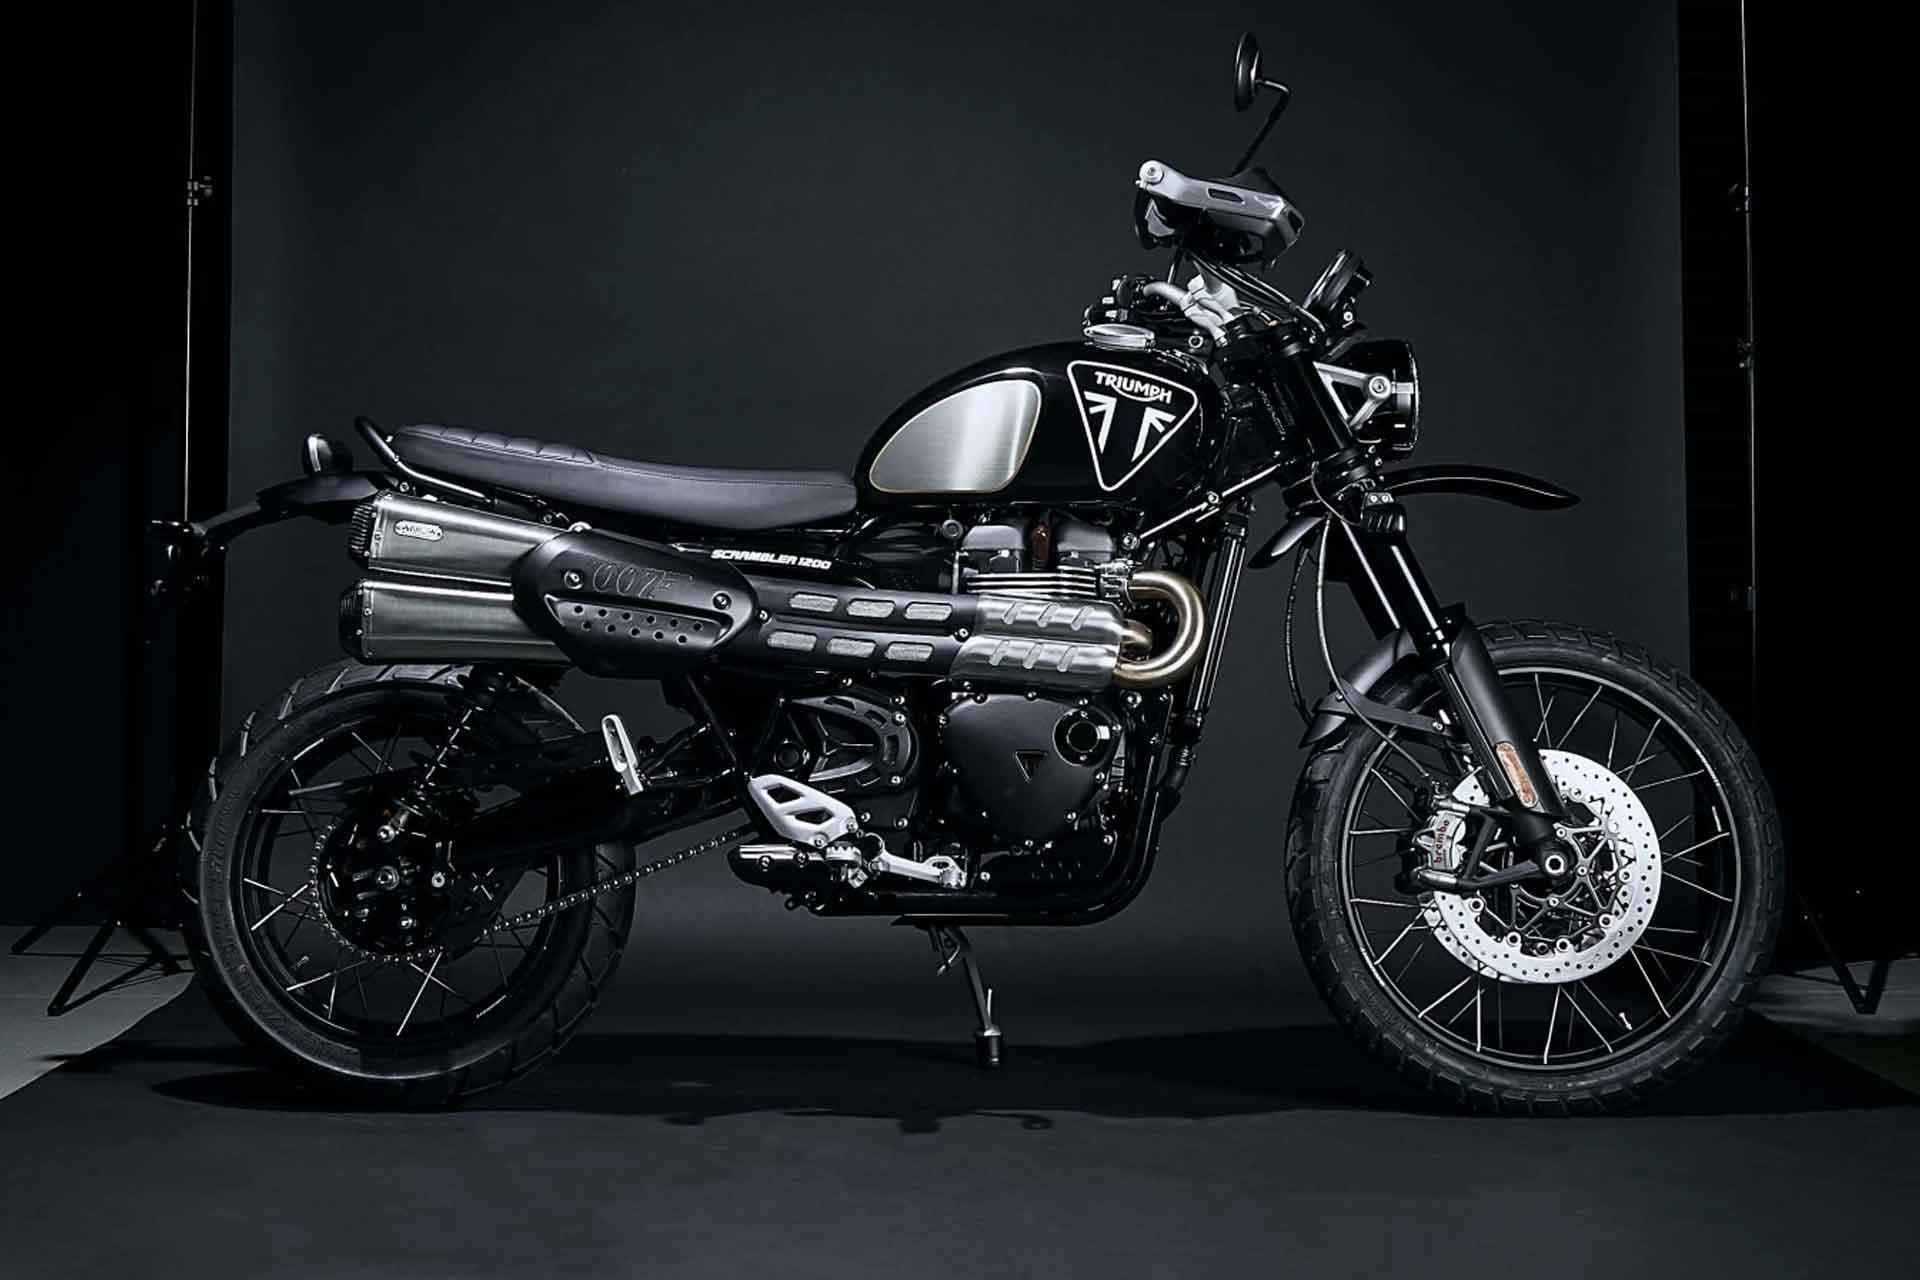 Triumph Scrambler 1200 Bond Edition Motorcycle